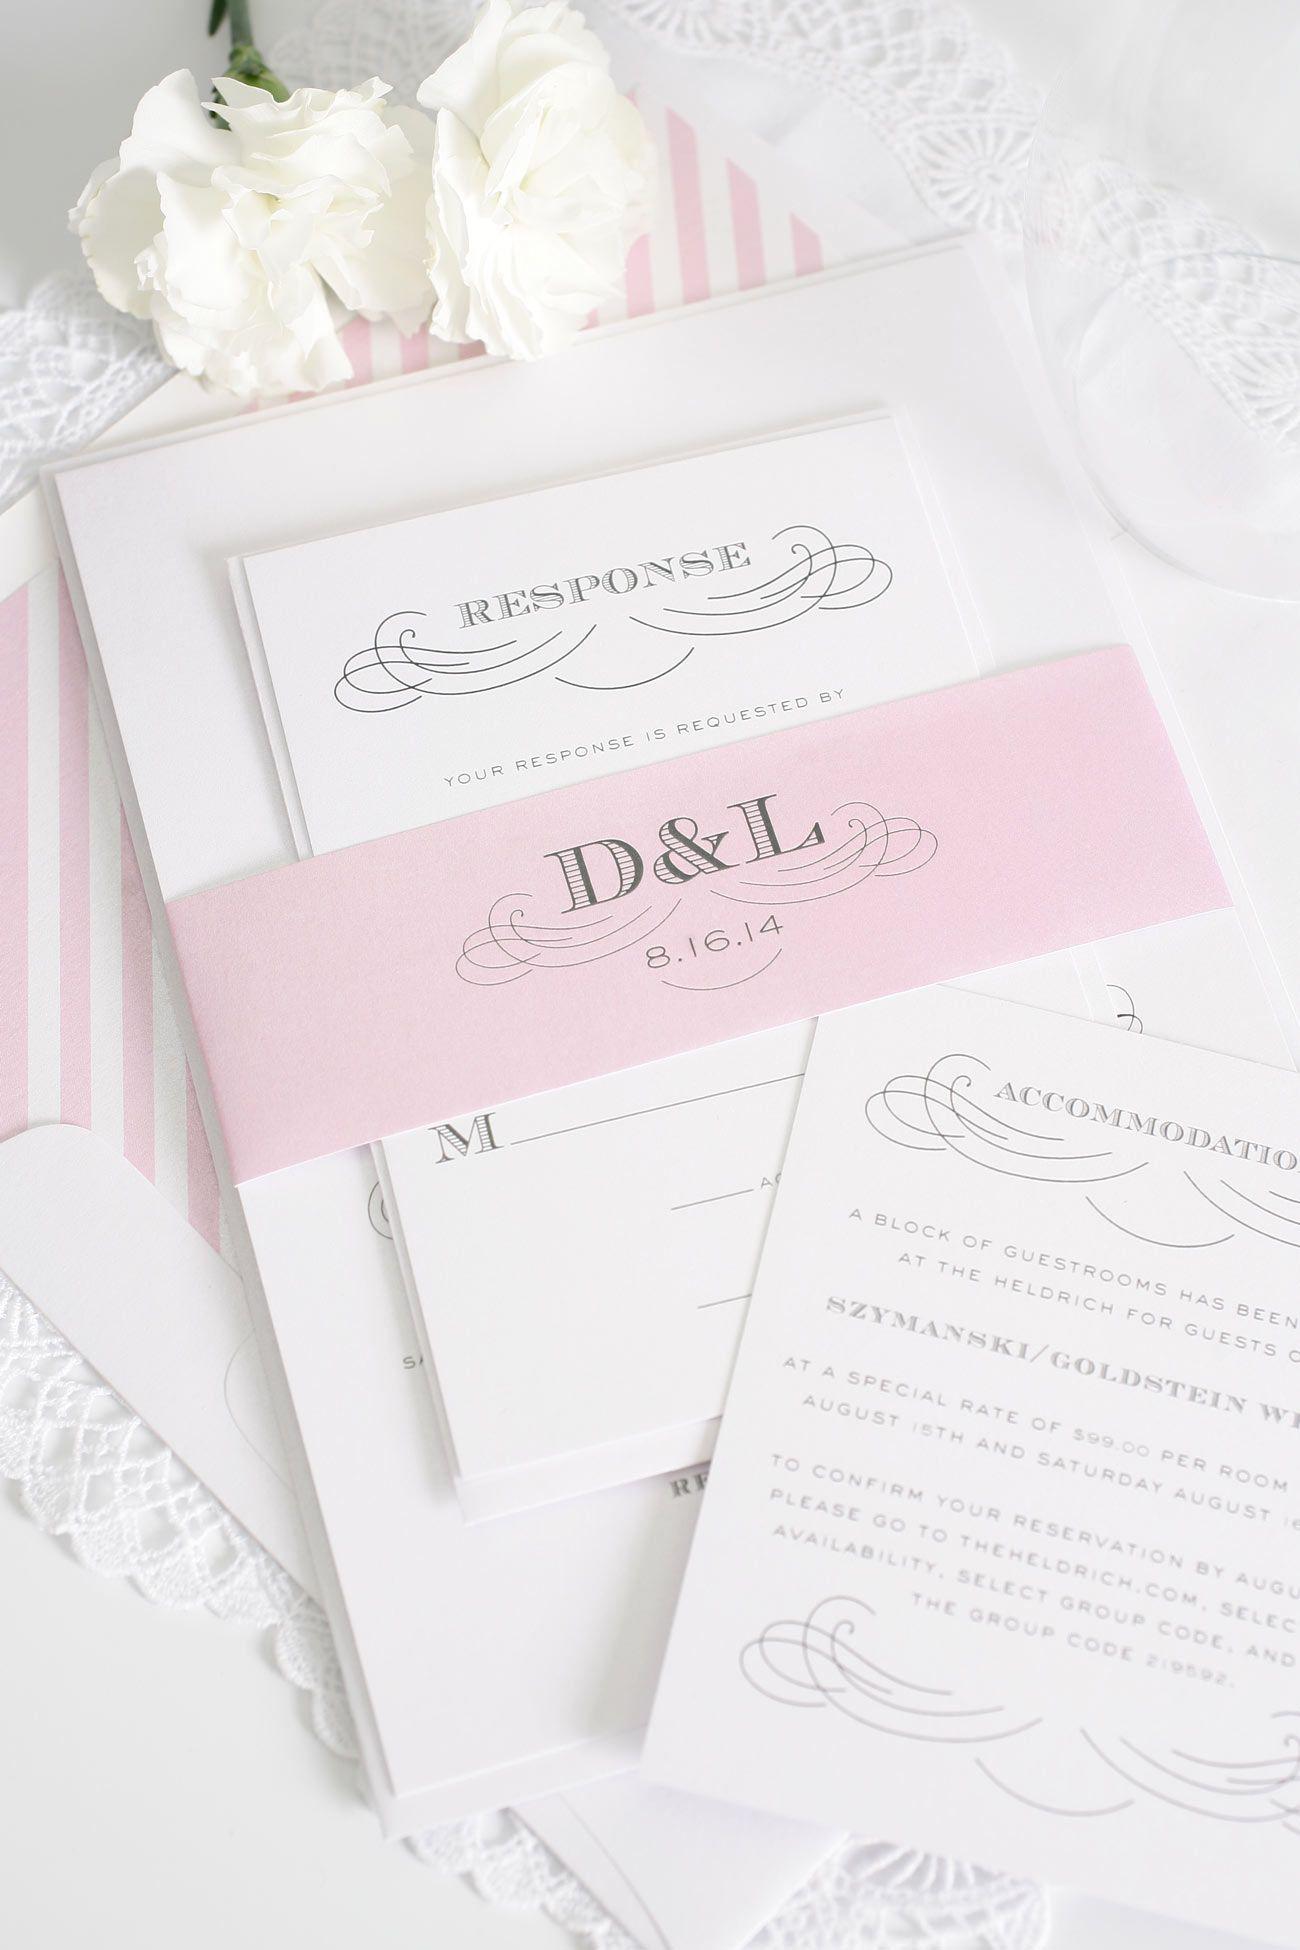 Vintage Wedding Invitations in Blossom Pink   Pink wedding ...